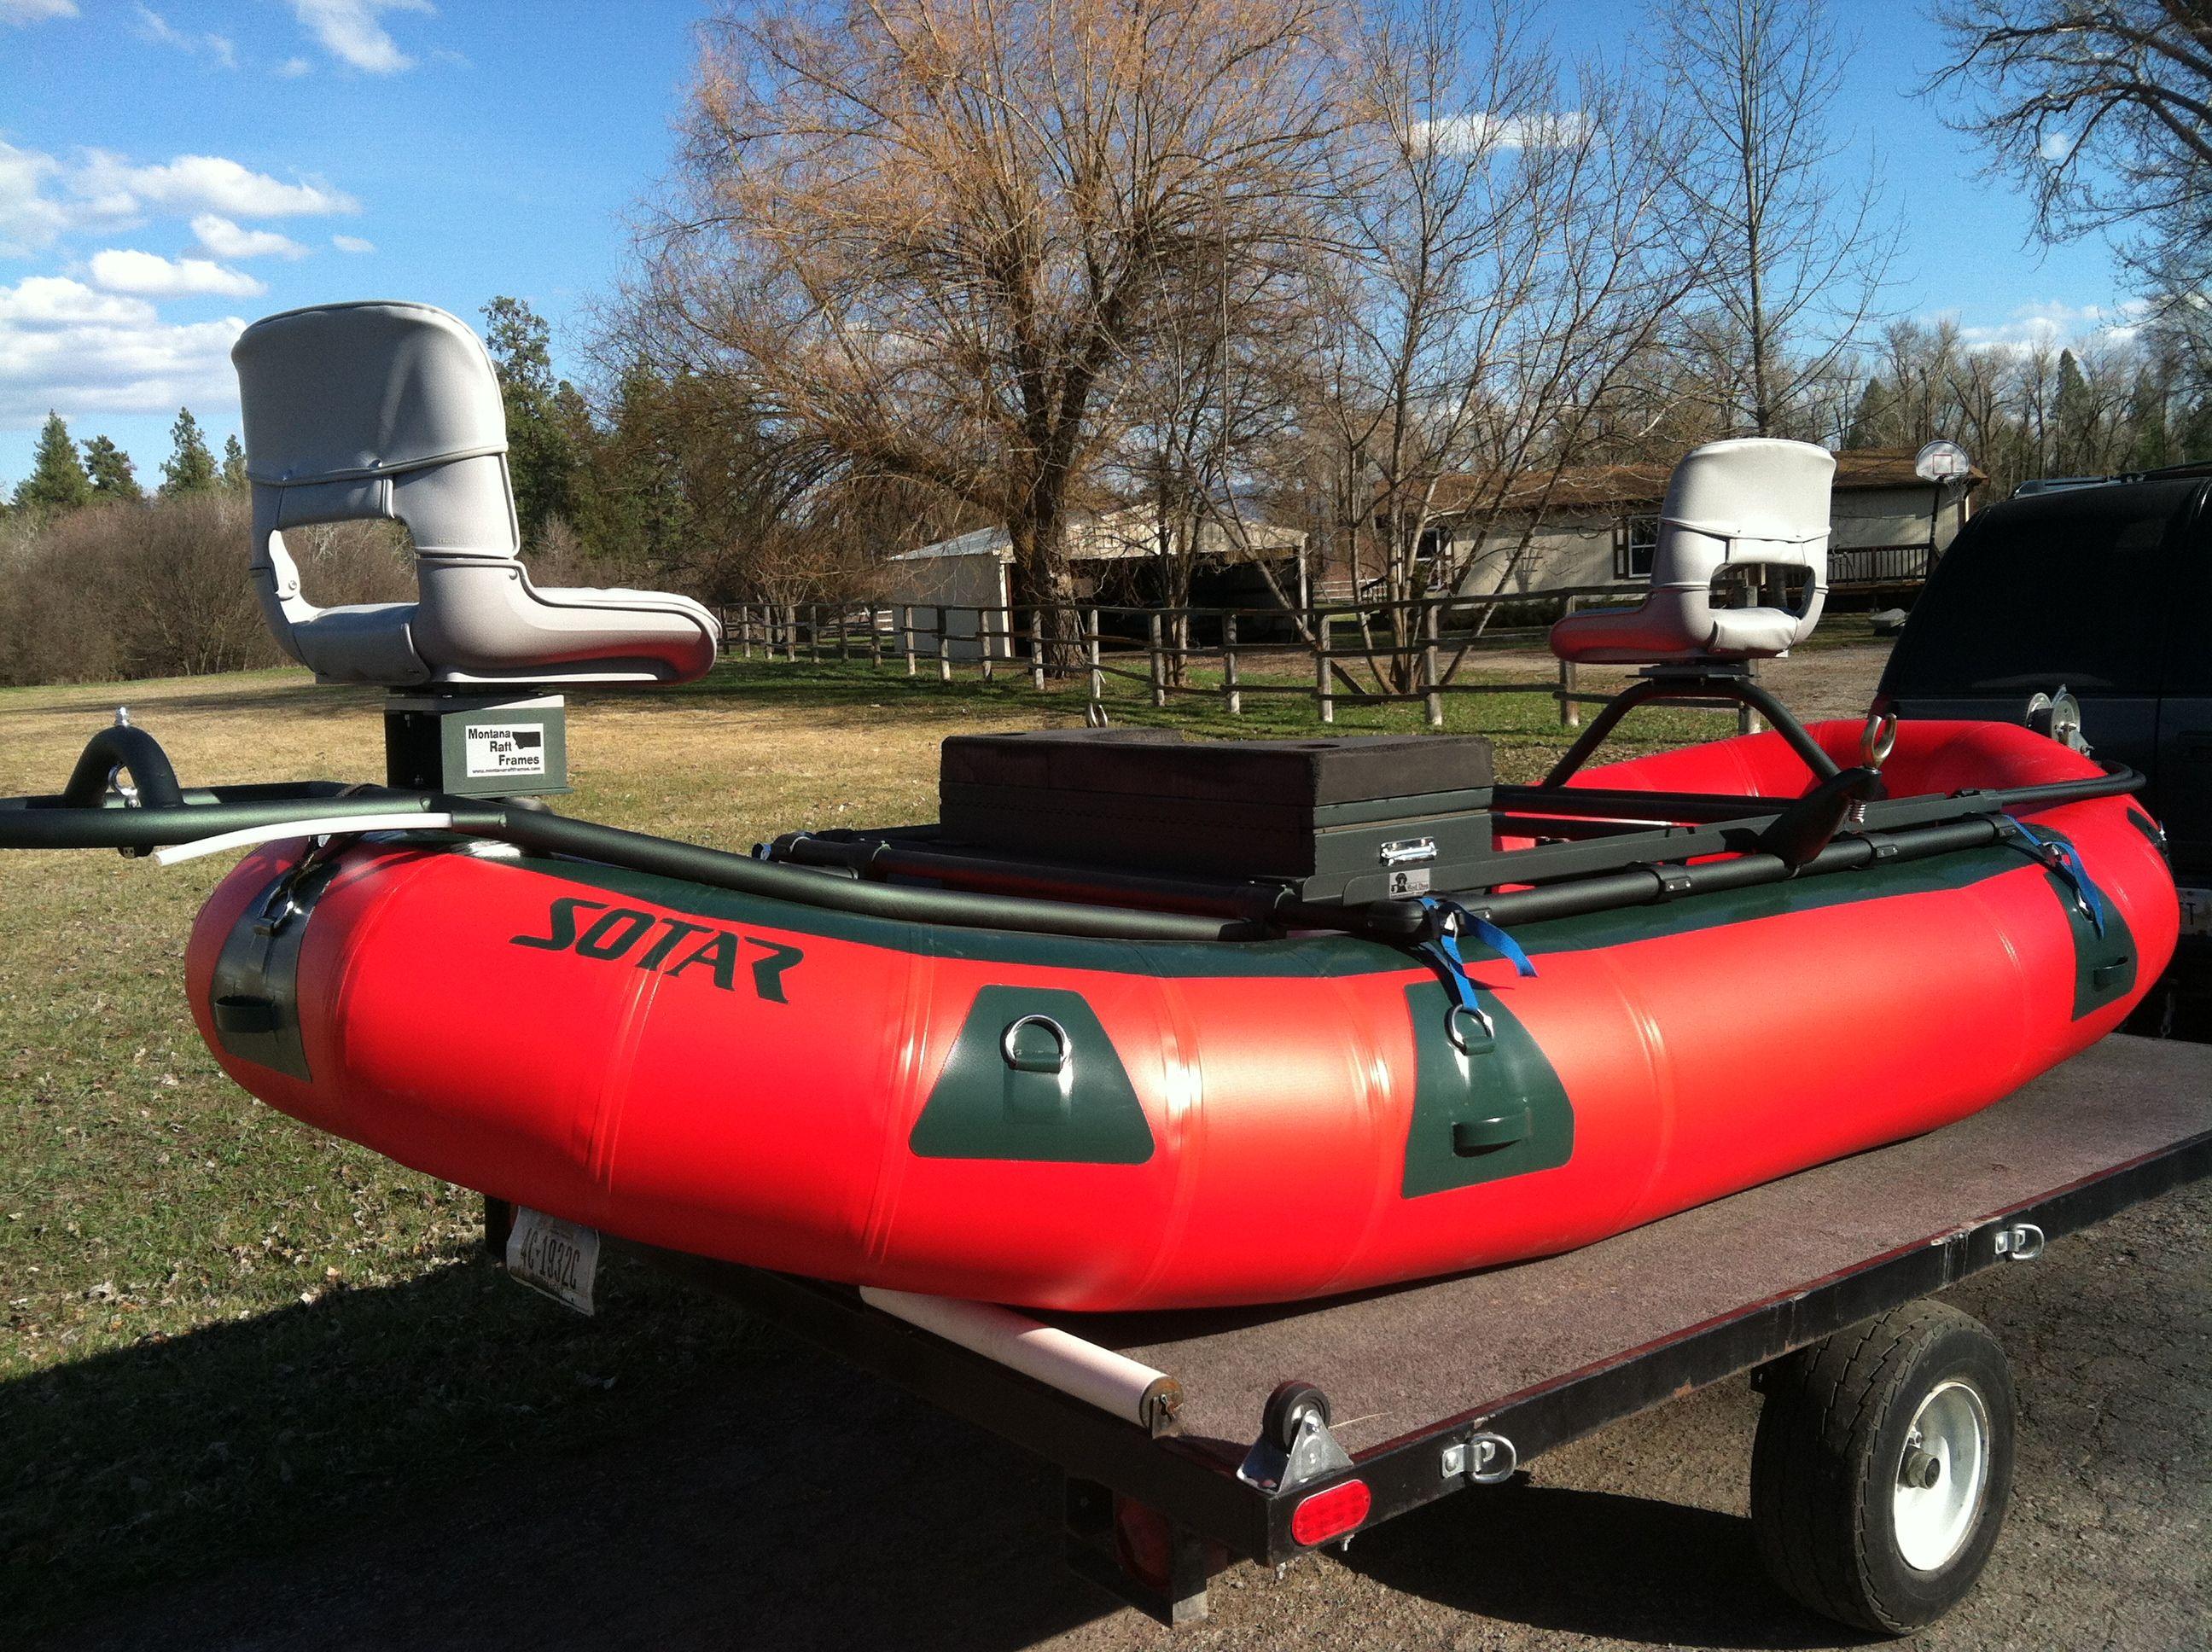 Montana raft frames sotar 39 strike fly fishing frame for Fly fishing raft